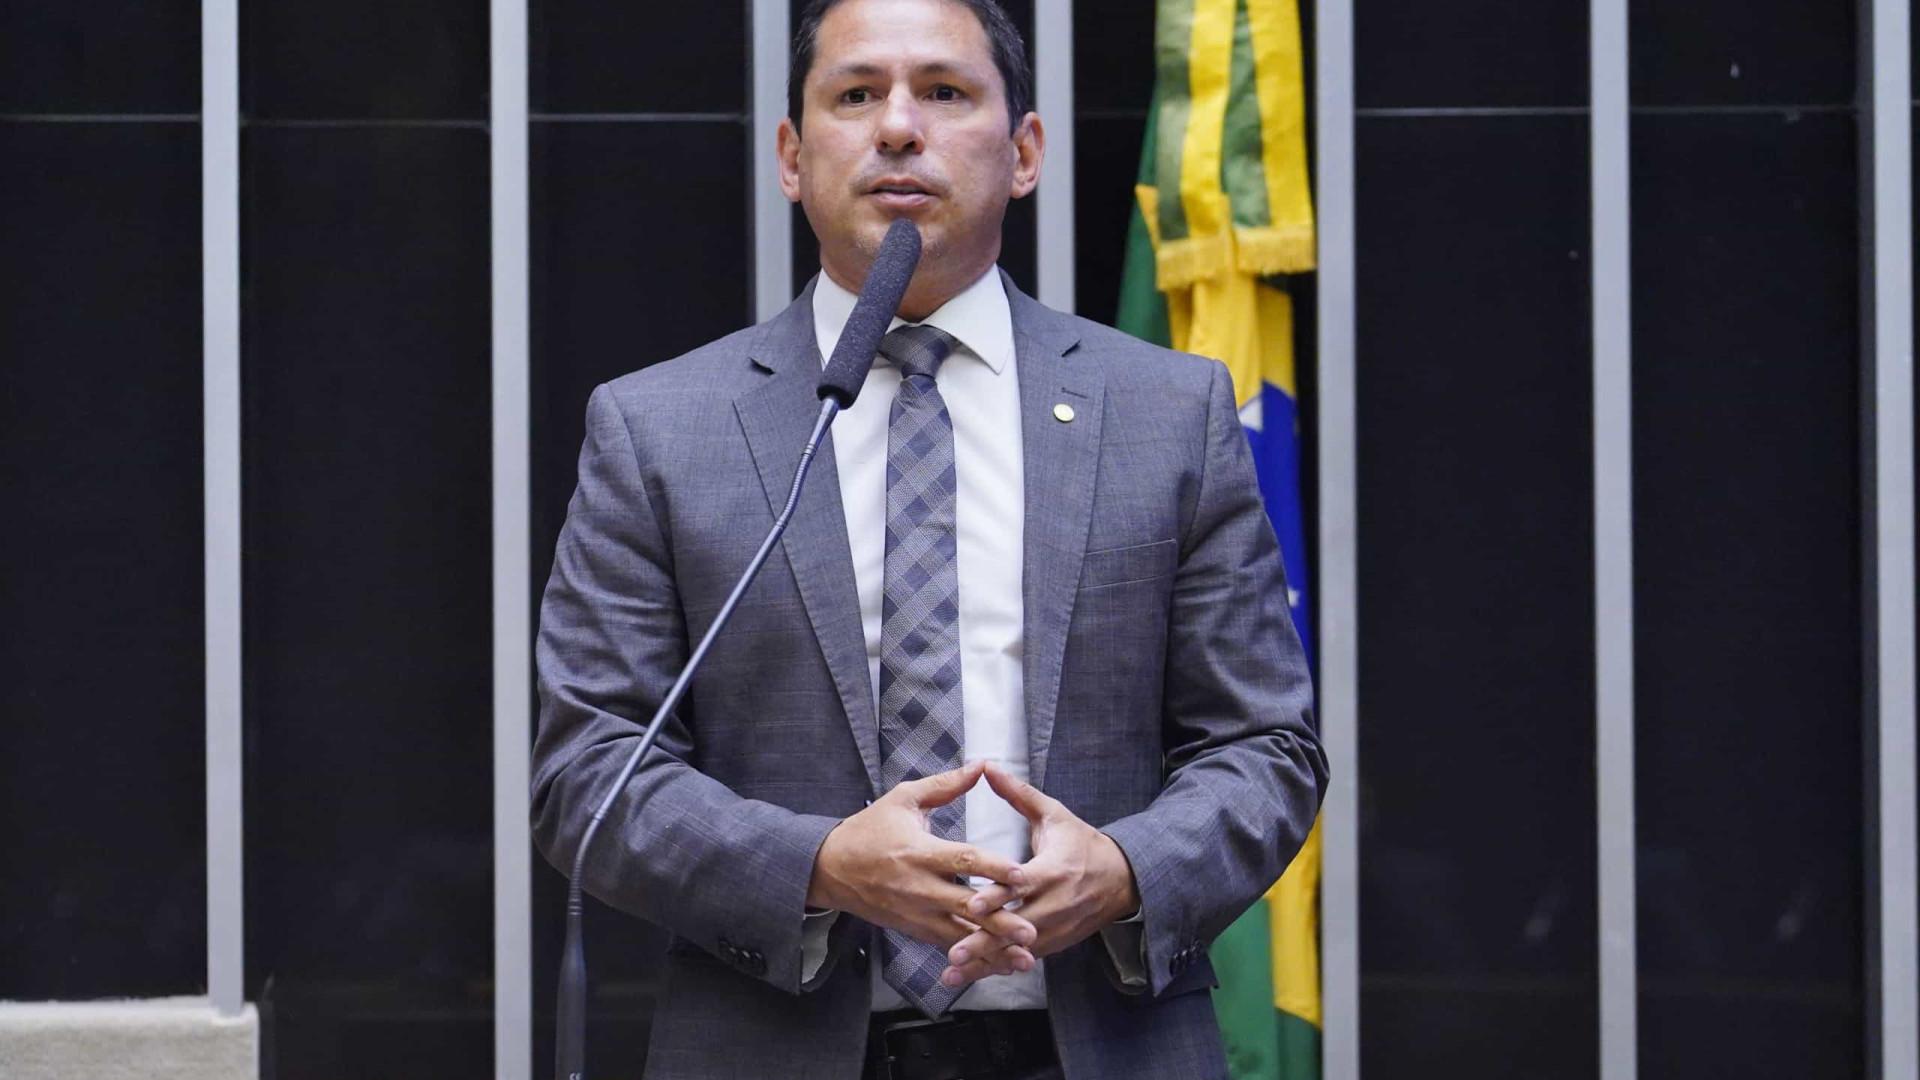 Vice-presidente da Câmara pede análise de pedidos de impeachment